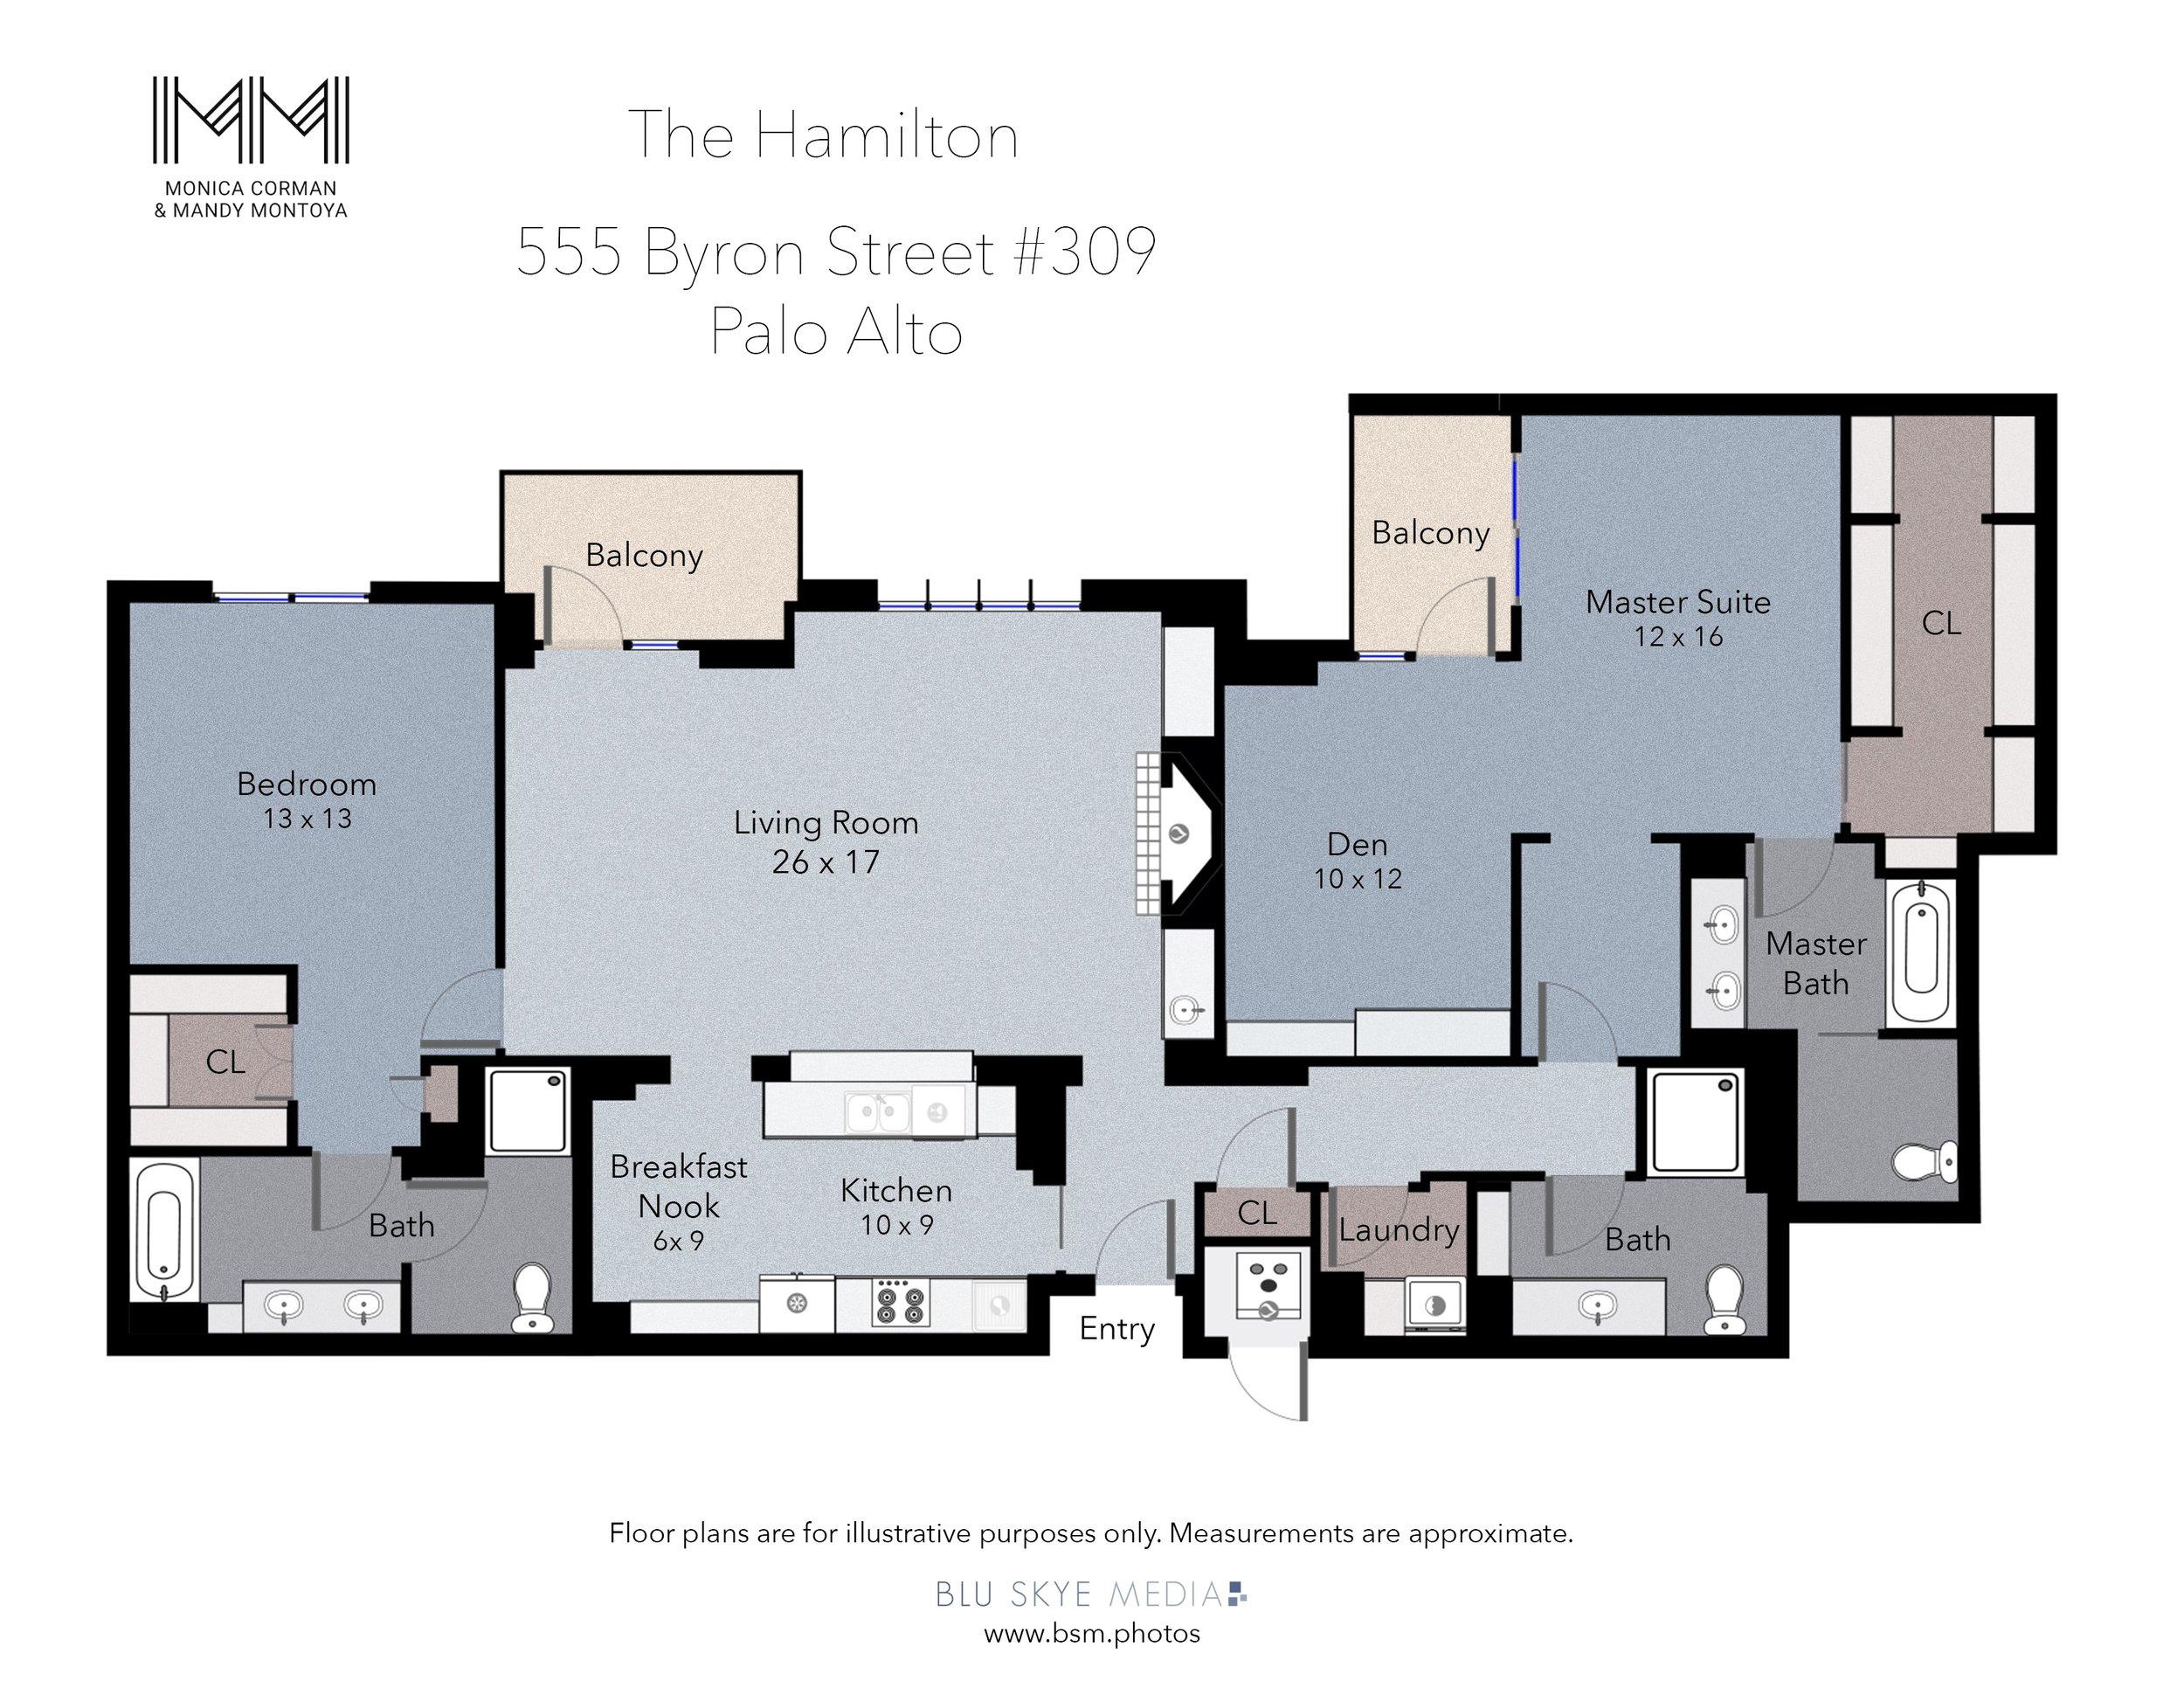 555 Byron St #309, Palo Alto Floor Plan.jpg